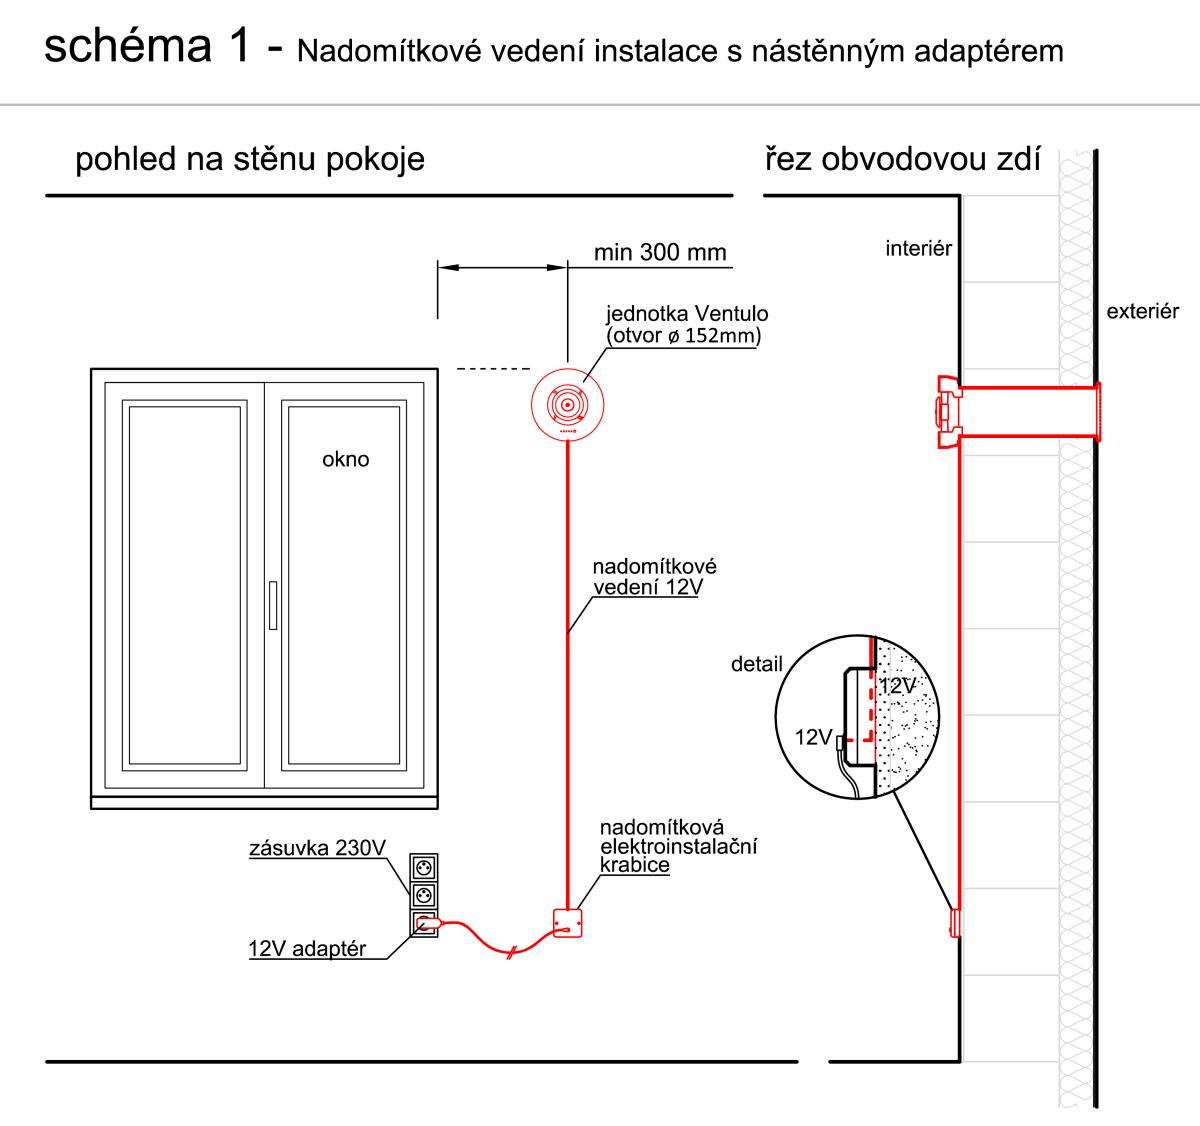 schéma 1 elektroinstalace jednotky Ventulo